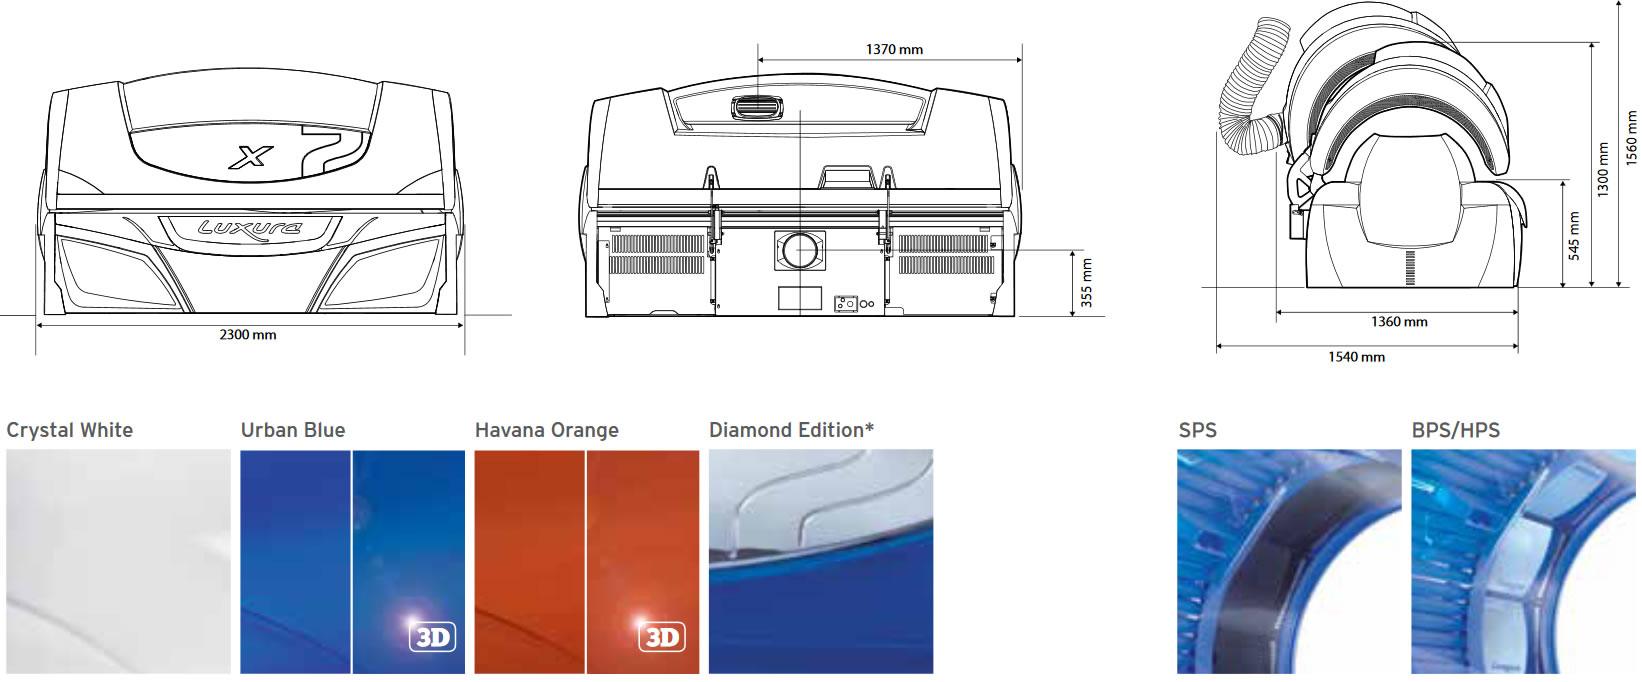 Варианты дизайна Luxura x7